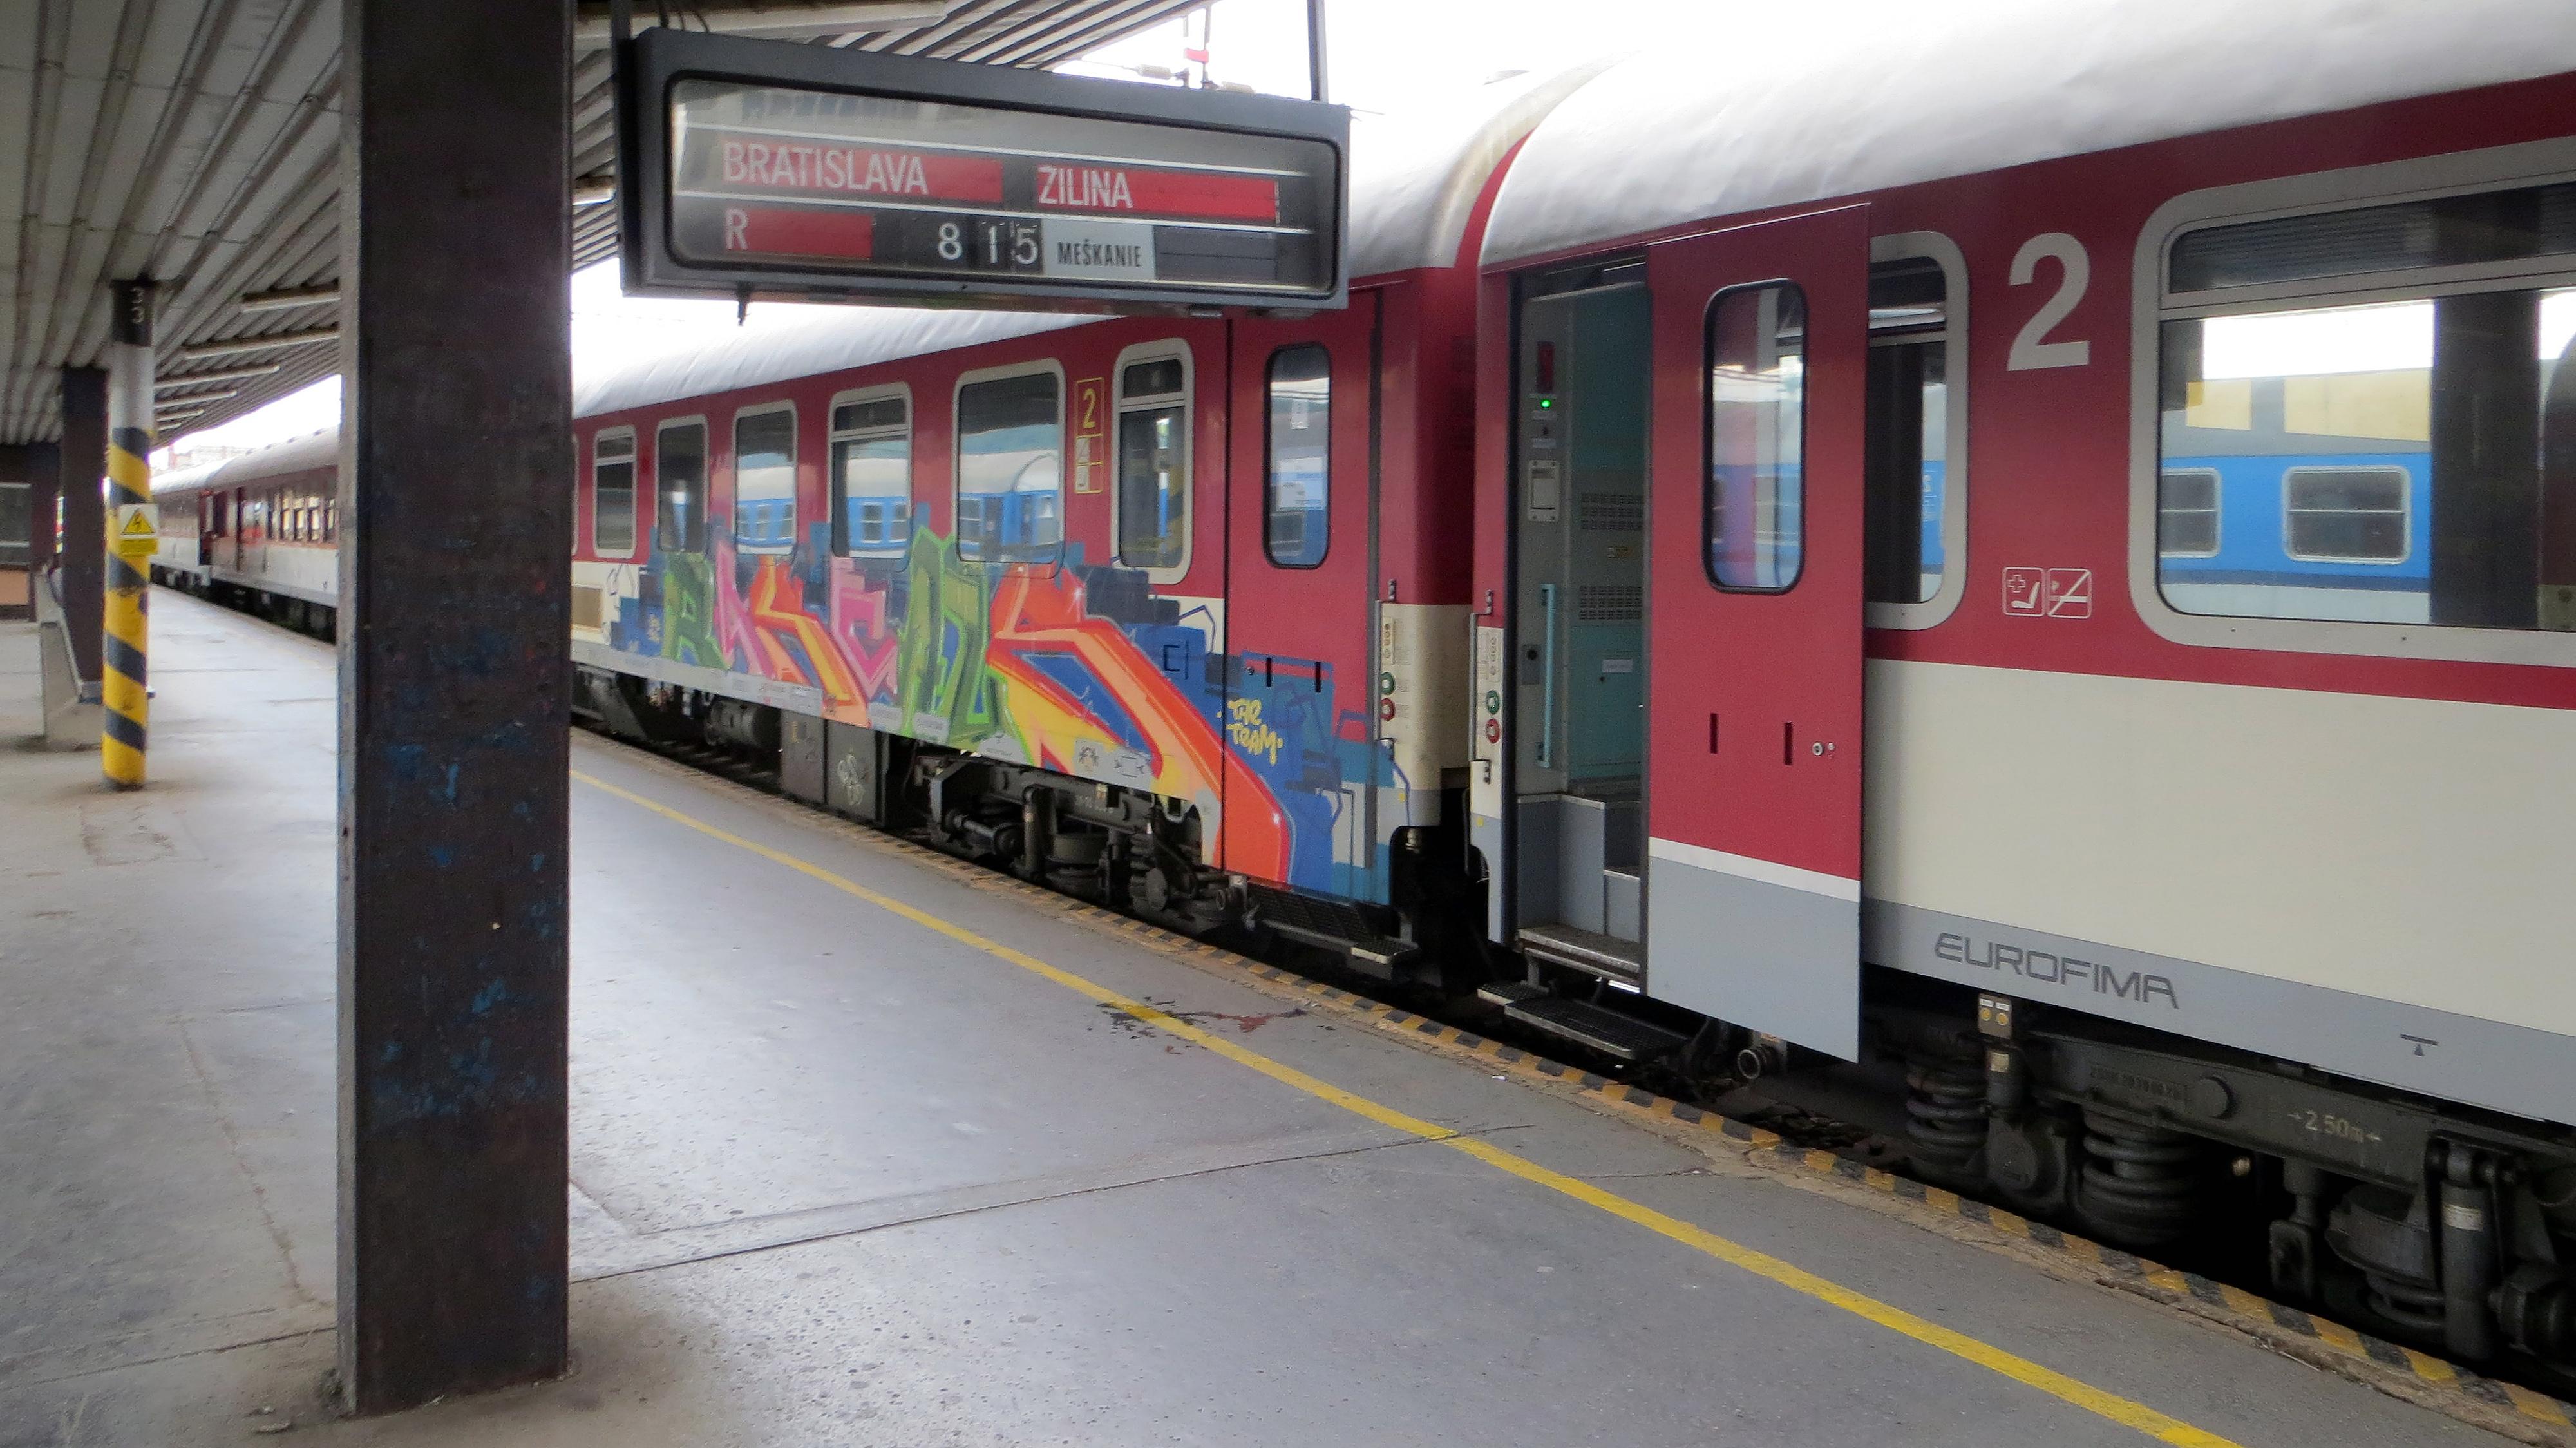 Trainstationspotting - Košice train station, Slovakia, 2013